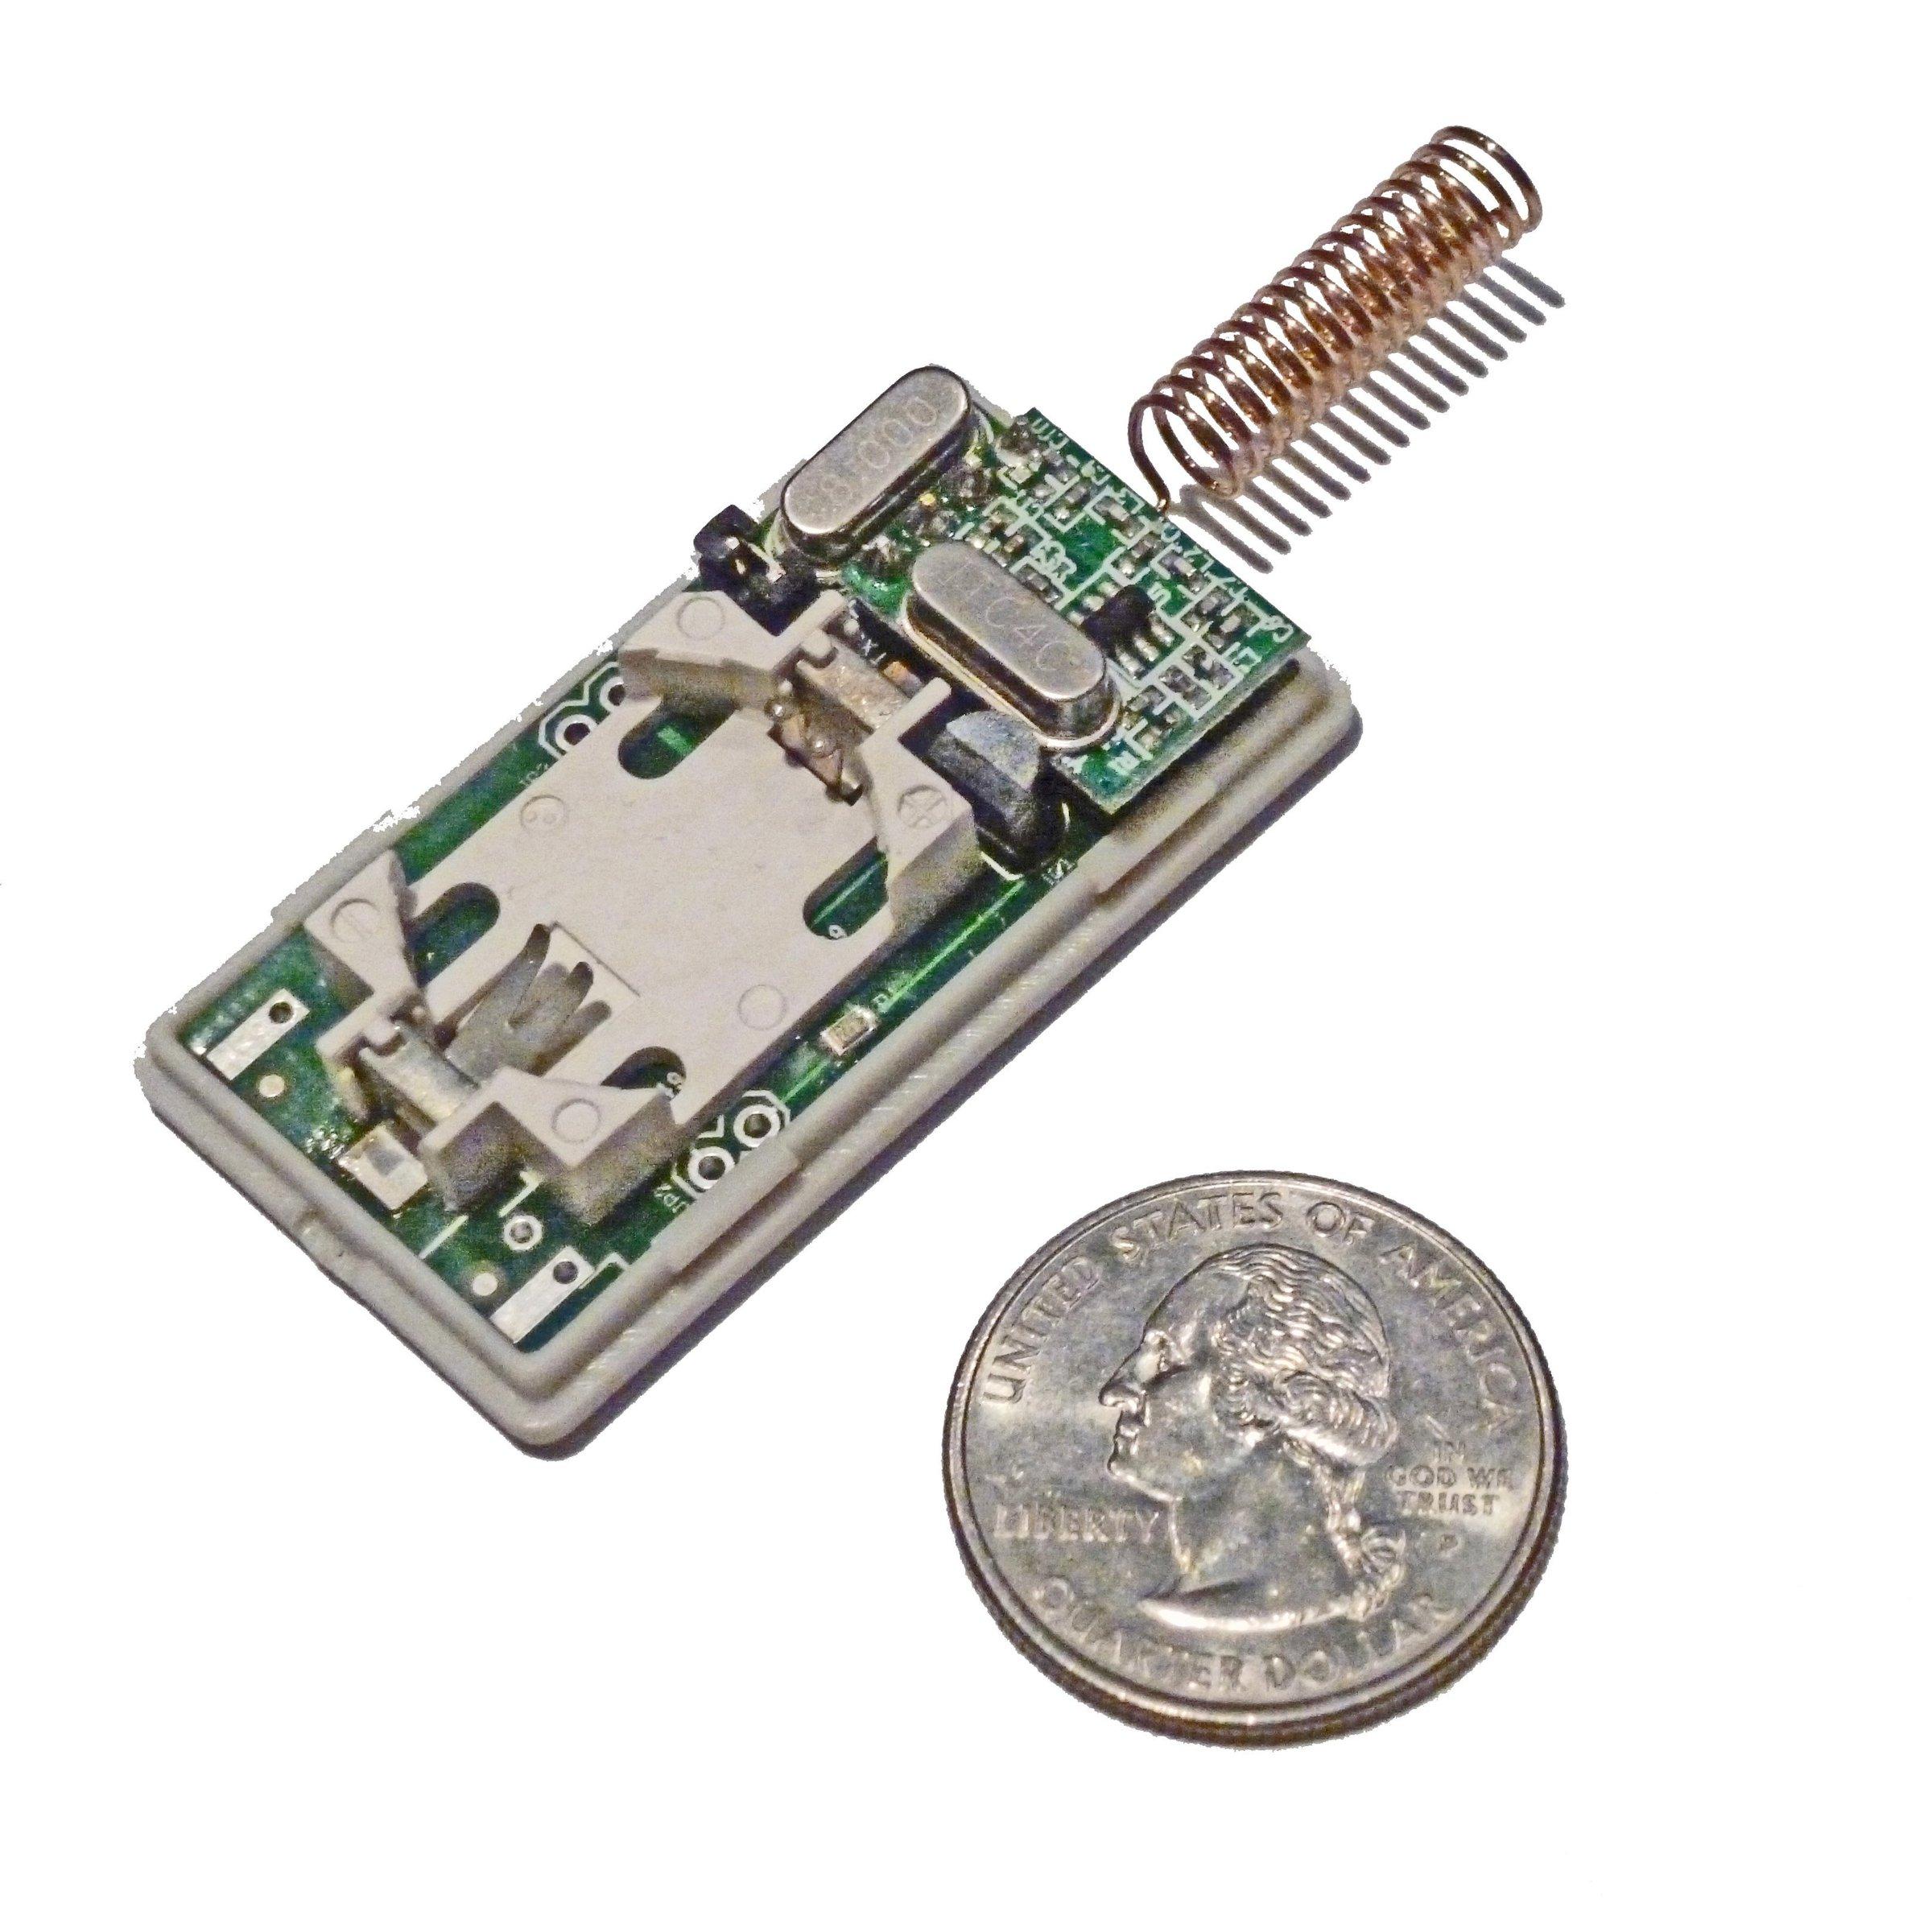 Mini Plant Moisture Sensor From Sensible Living Llc On Tindie Circuits Soil Tester Circuit Alarm Sale General Purpose Wireless Board